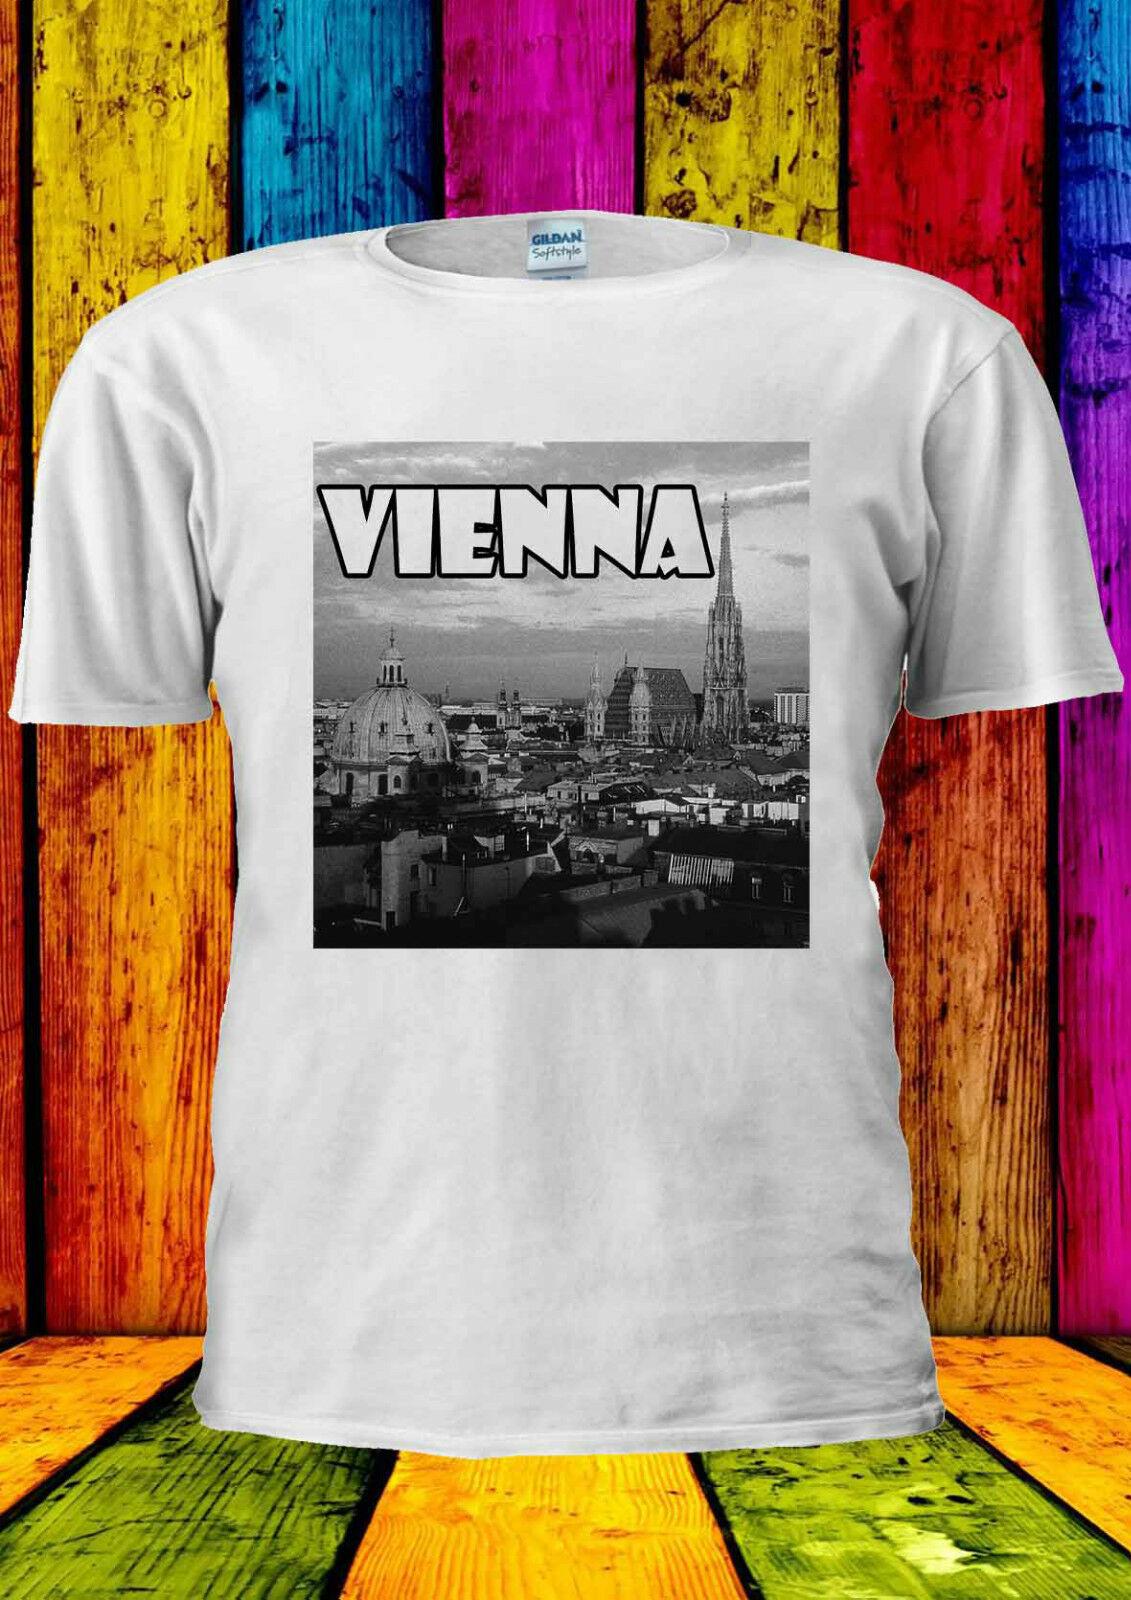 Vienna Austria Dream City Tumblr camiseta chaleco hombres mujeres Unisex 1517 nuevas camisetas, camiseta de moda para hombre 2019